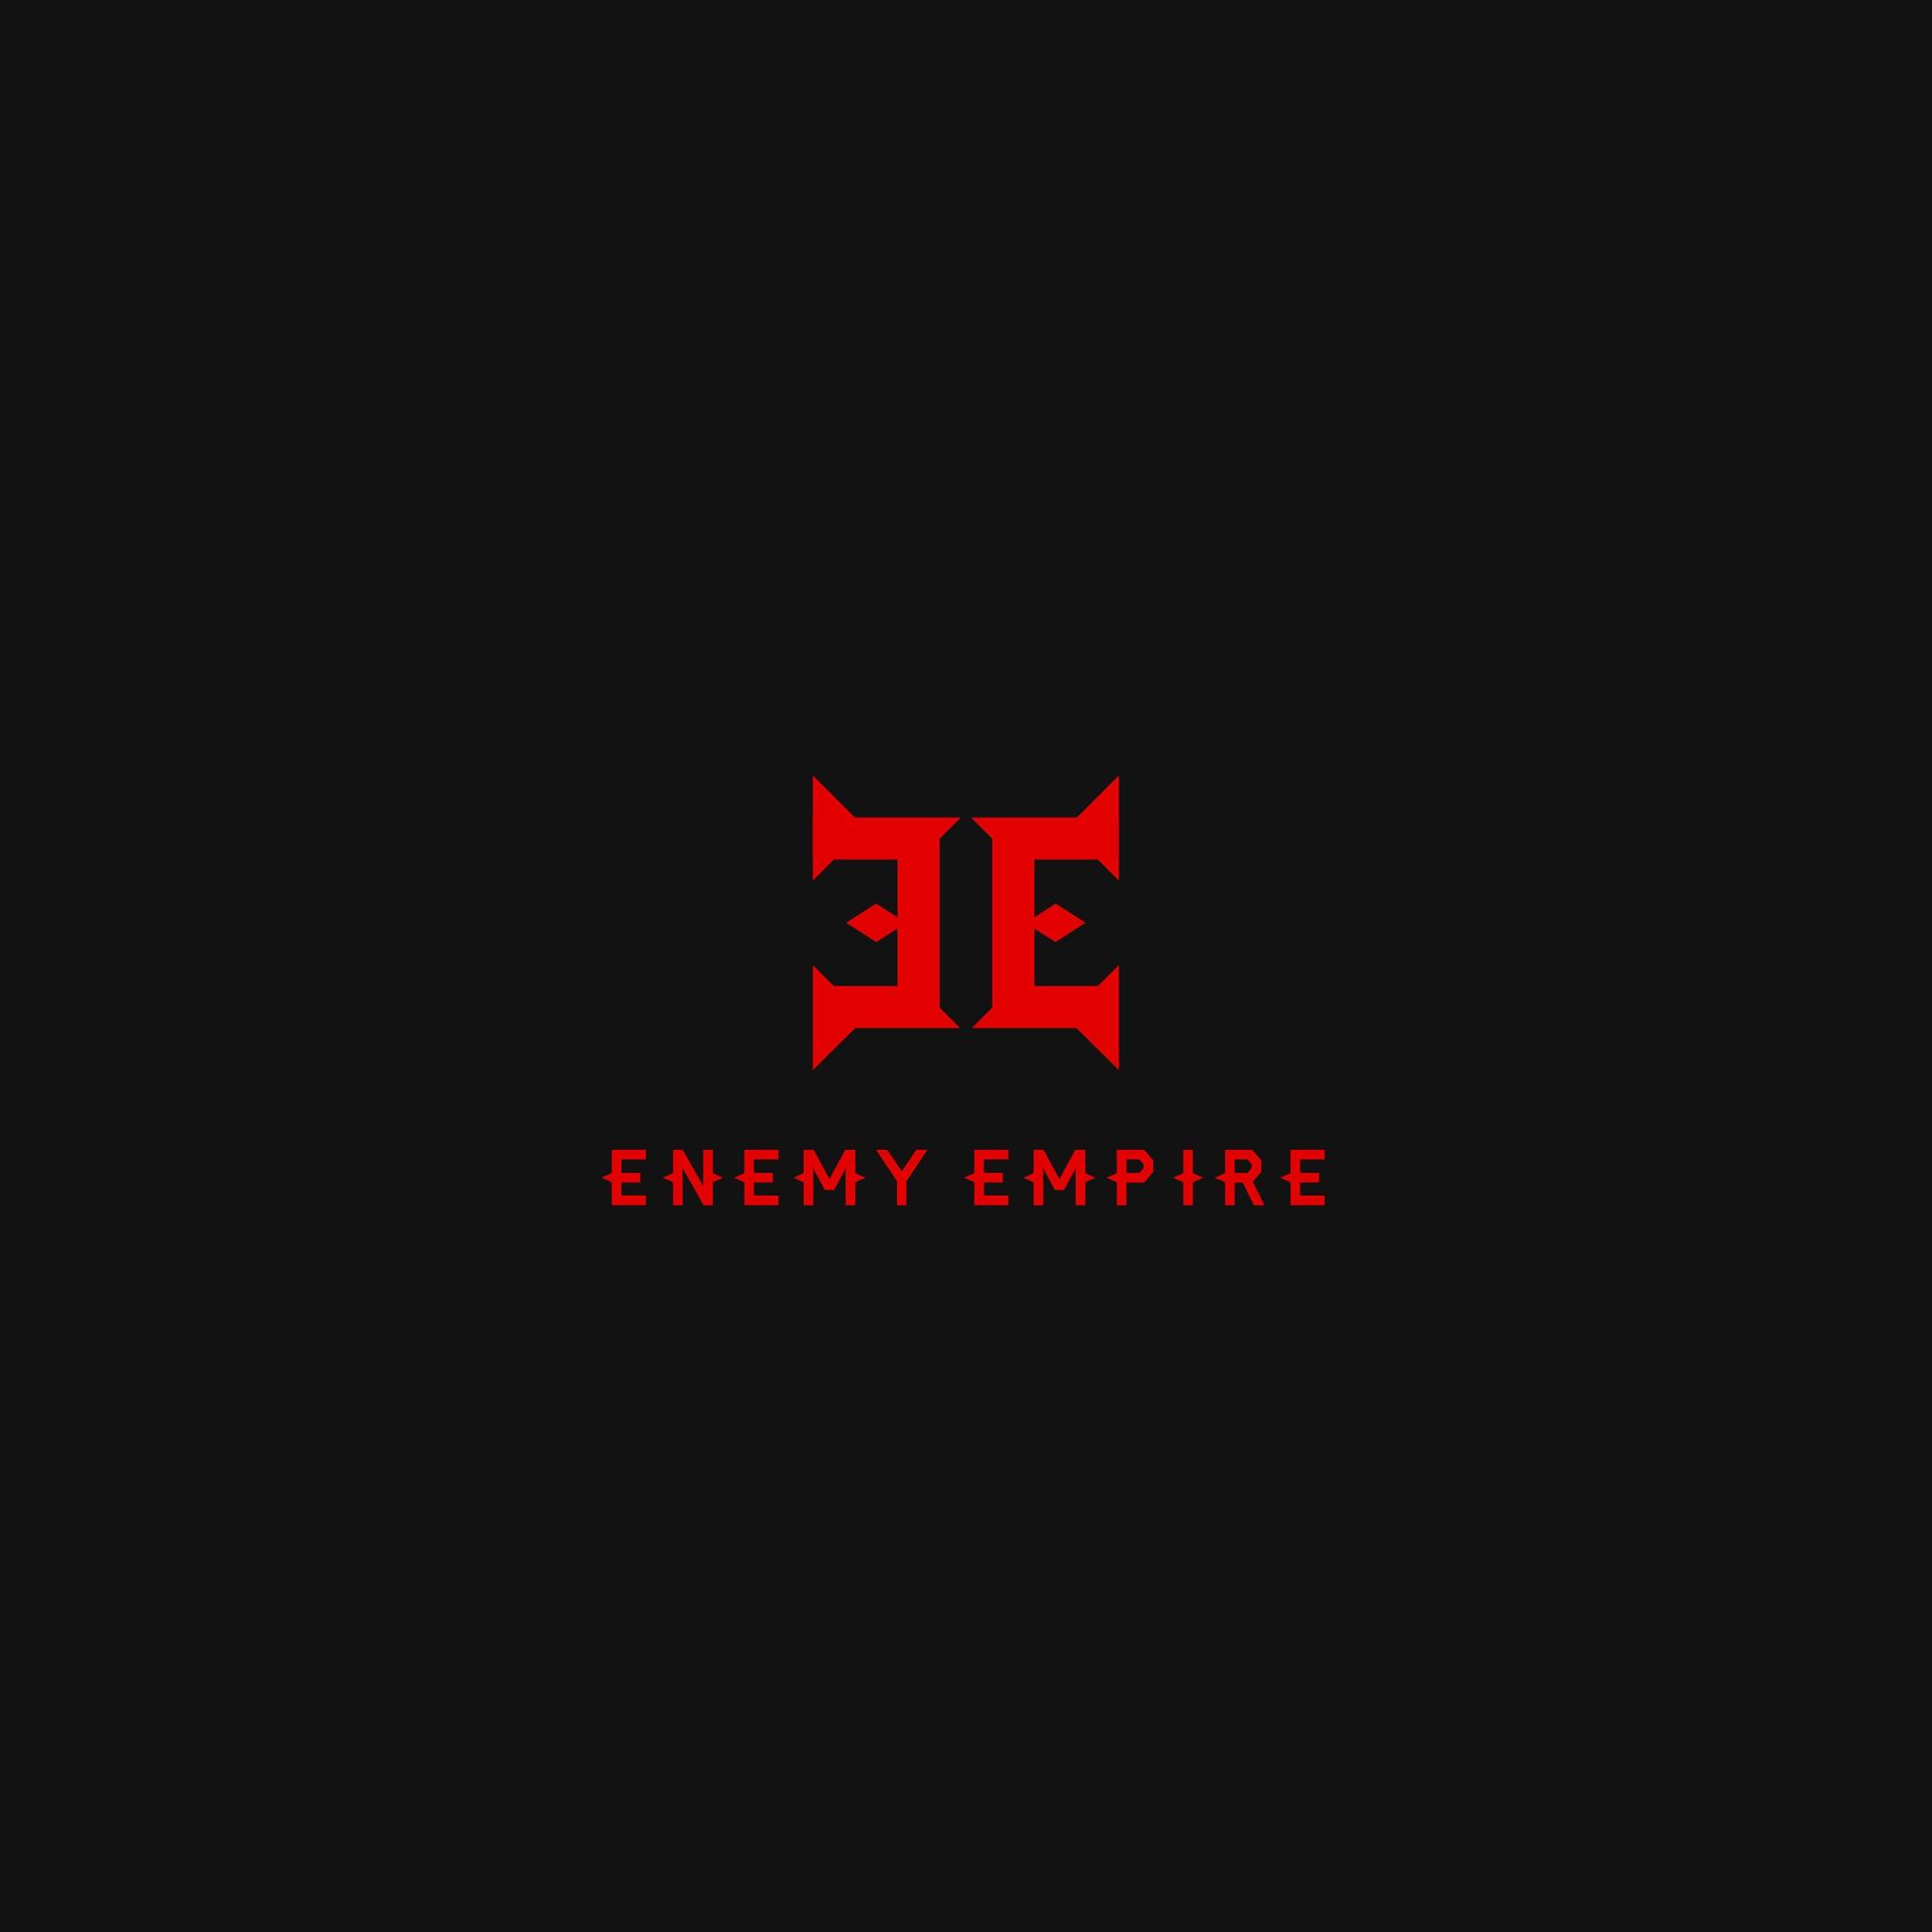 Enemy Empire Logo